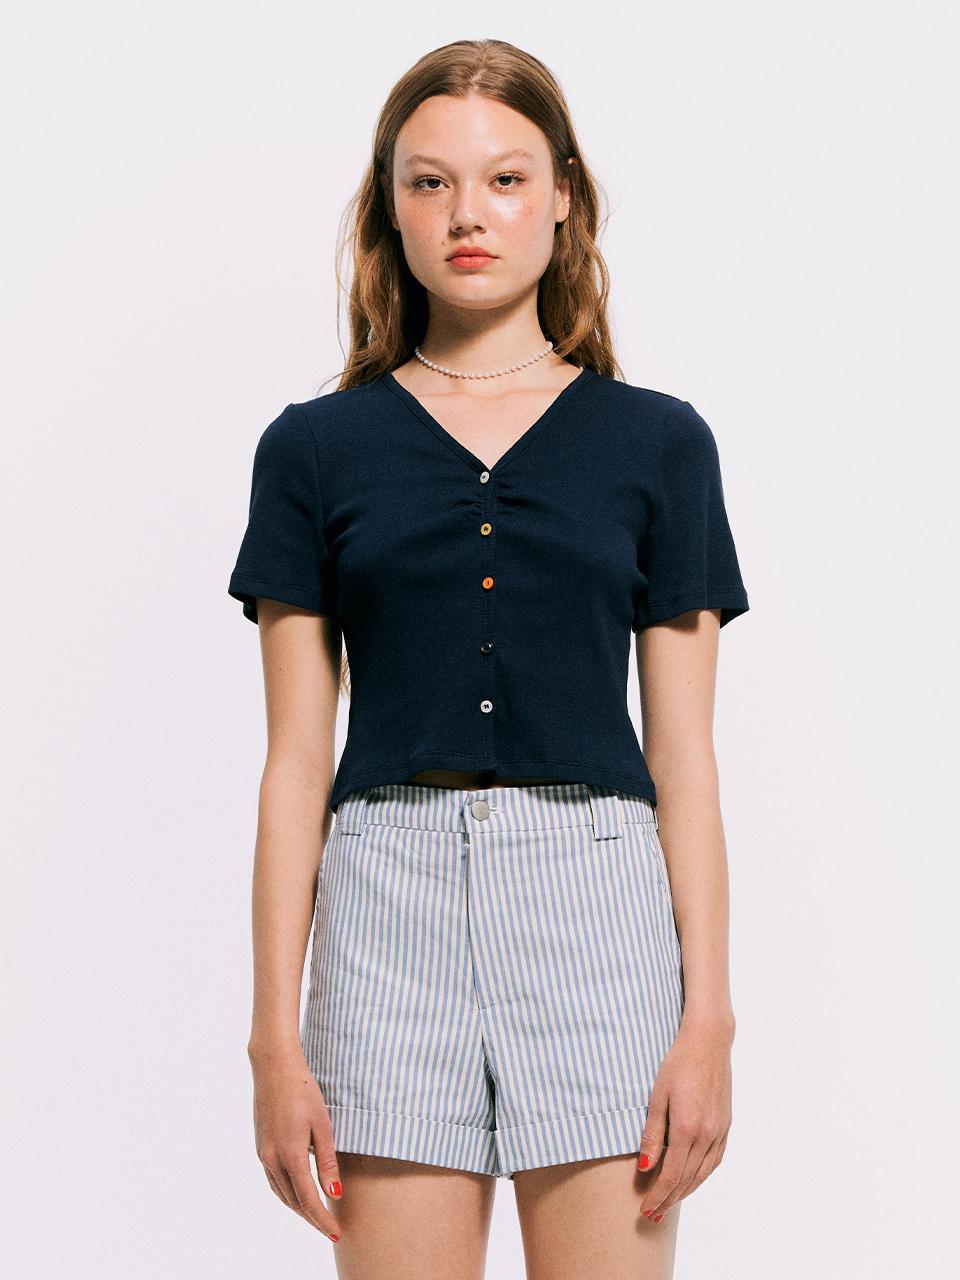 5 Color button cardigan Top_Navy